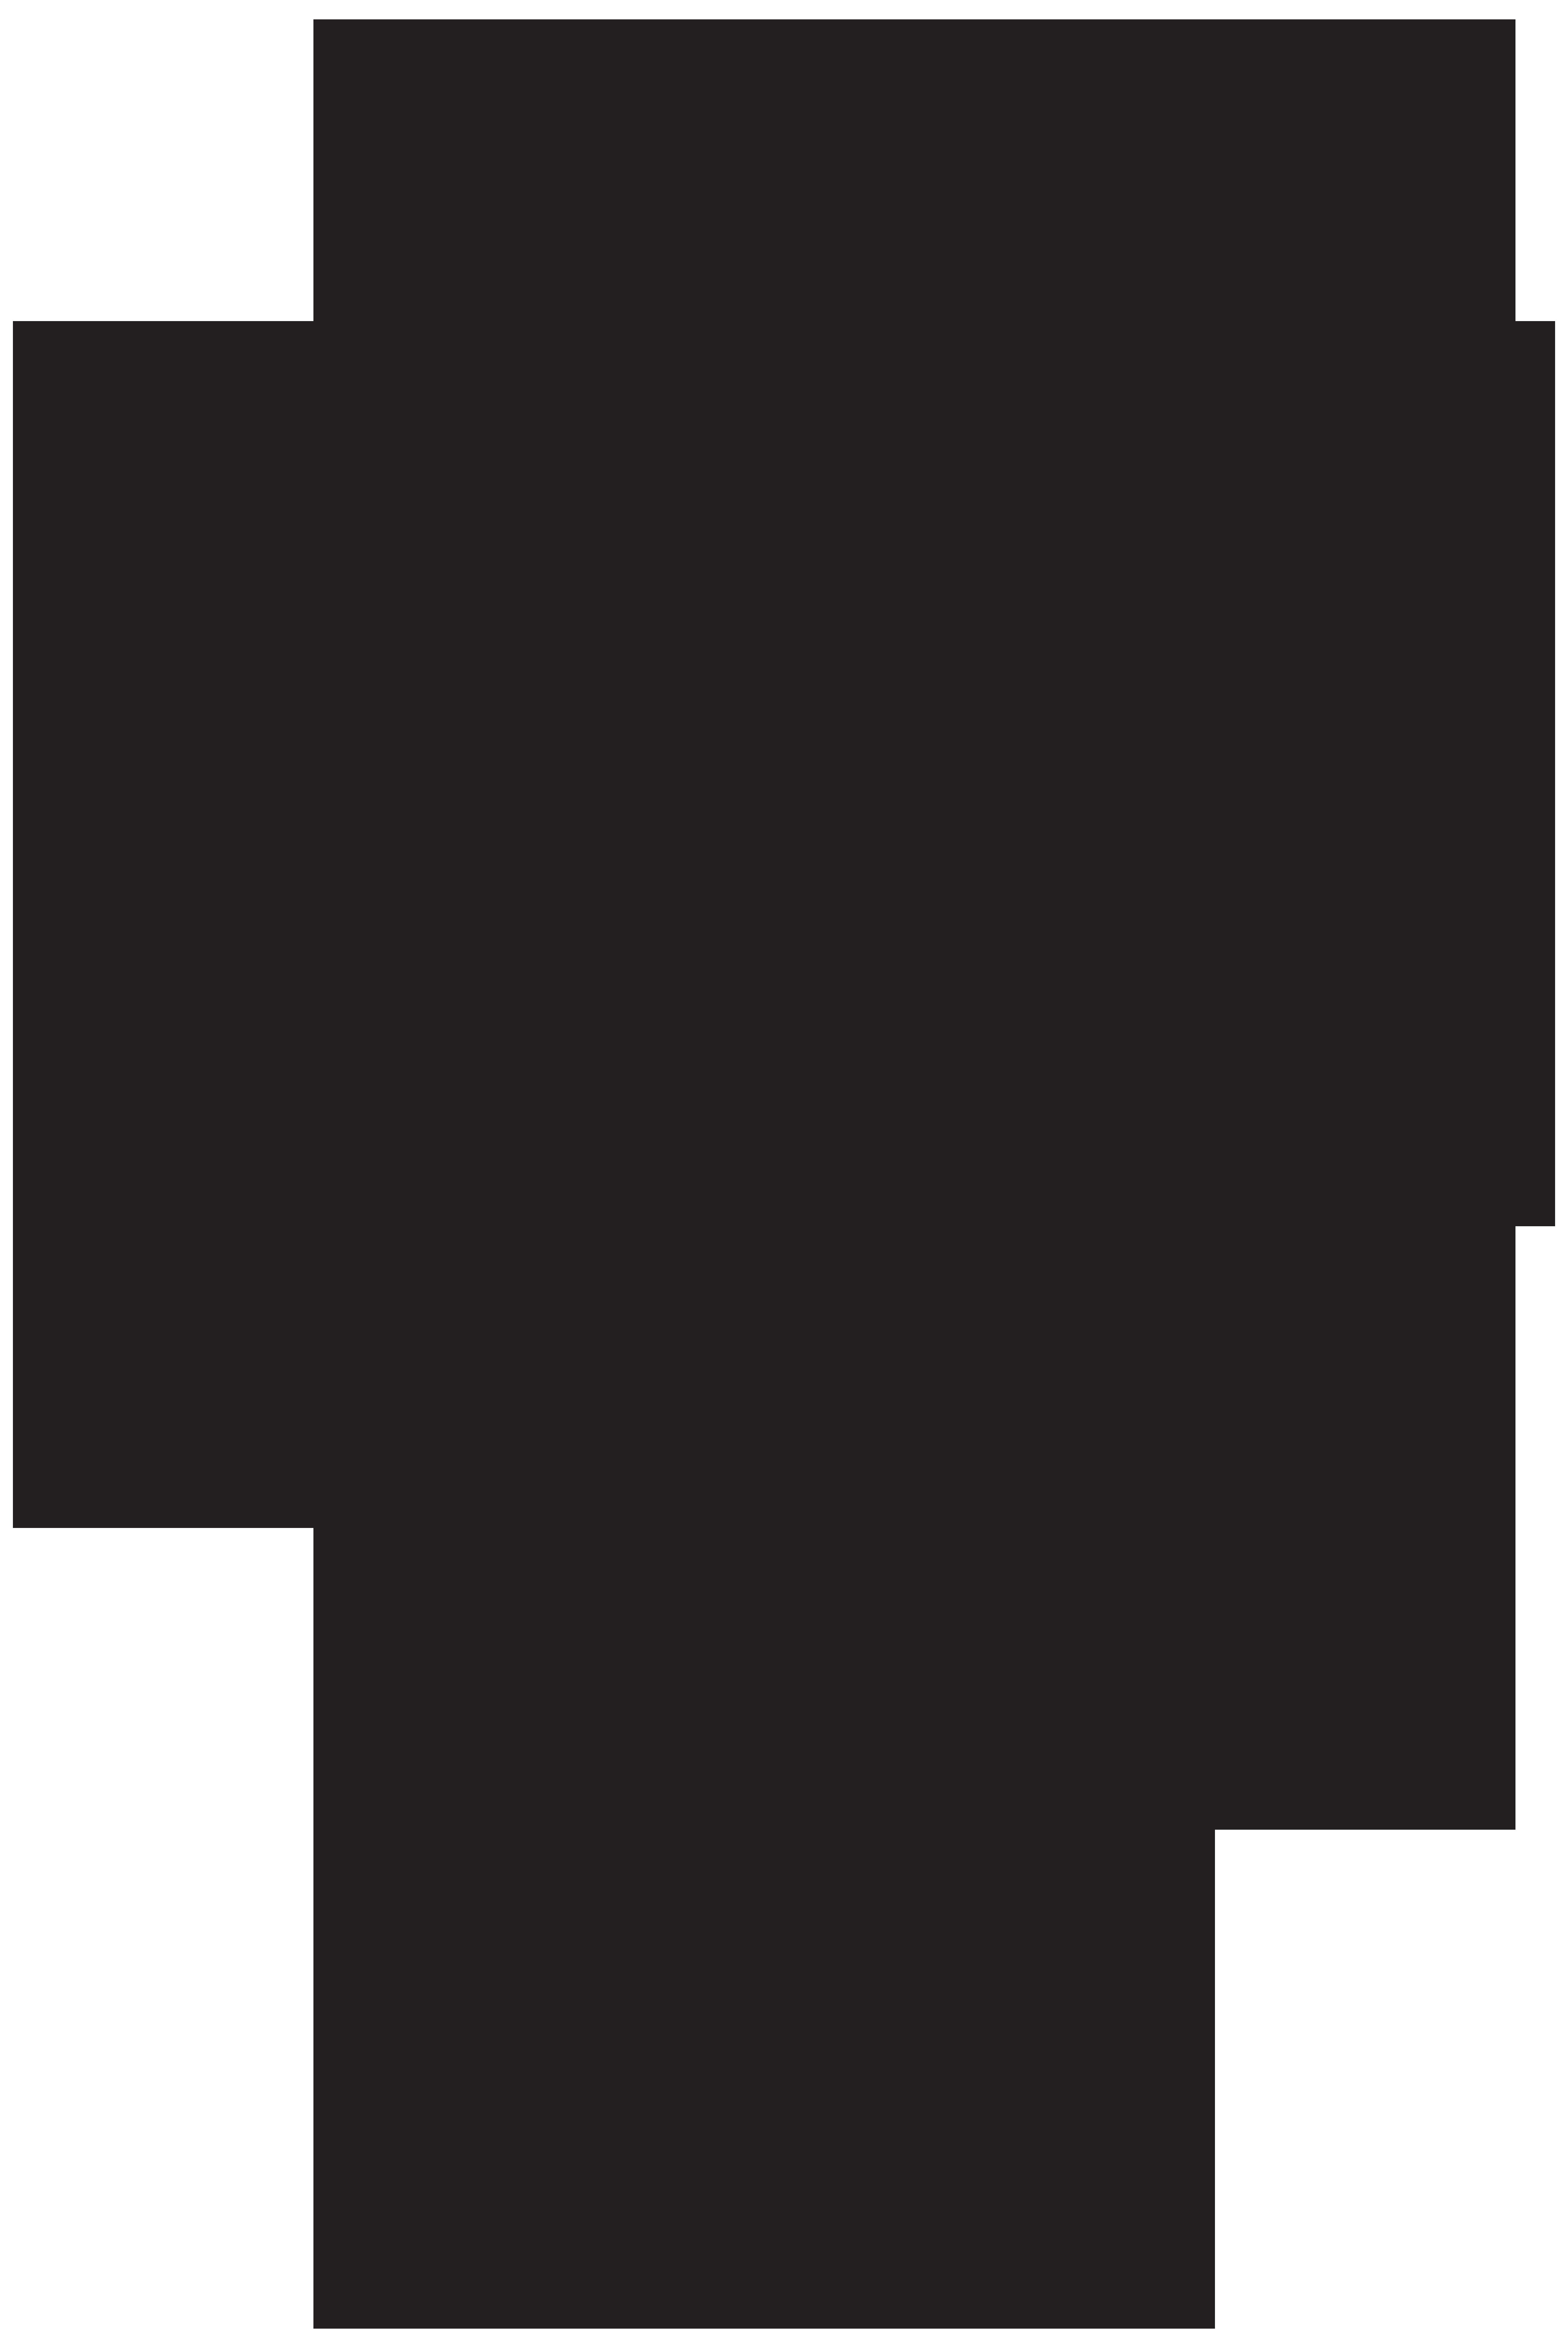 Brazilian Samba Dancer Silhouette PNG Clip Art Image.